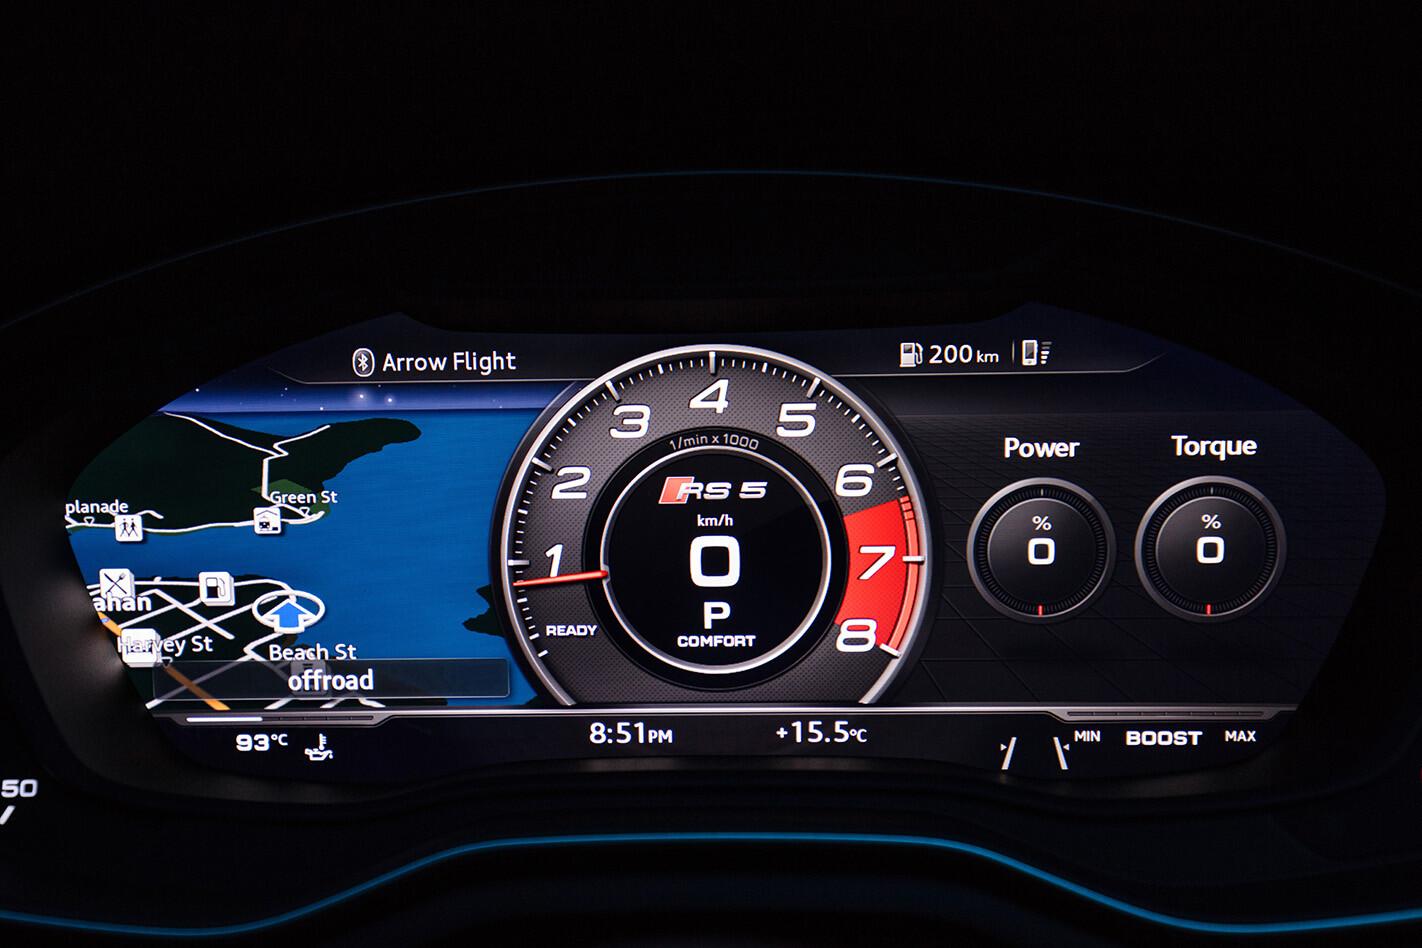 2018 Audi Rs 5 Green Interior Instruments Jpg